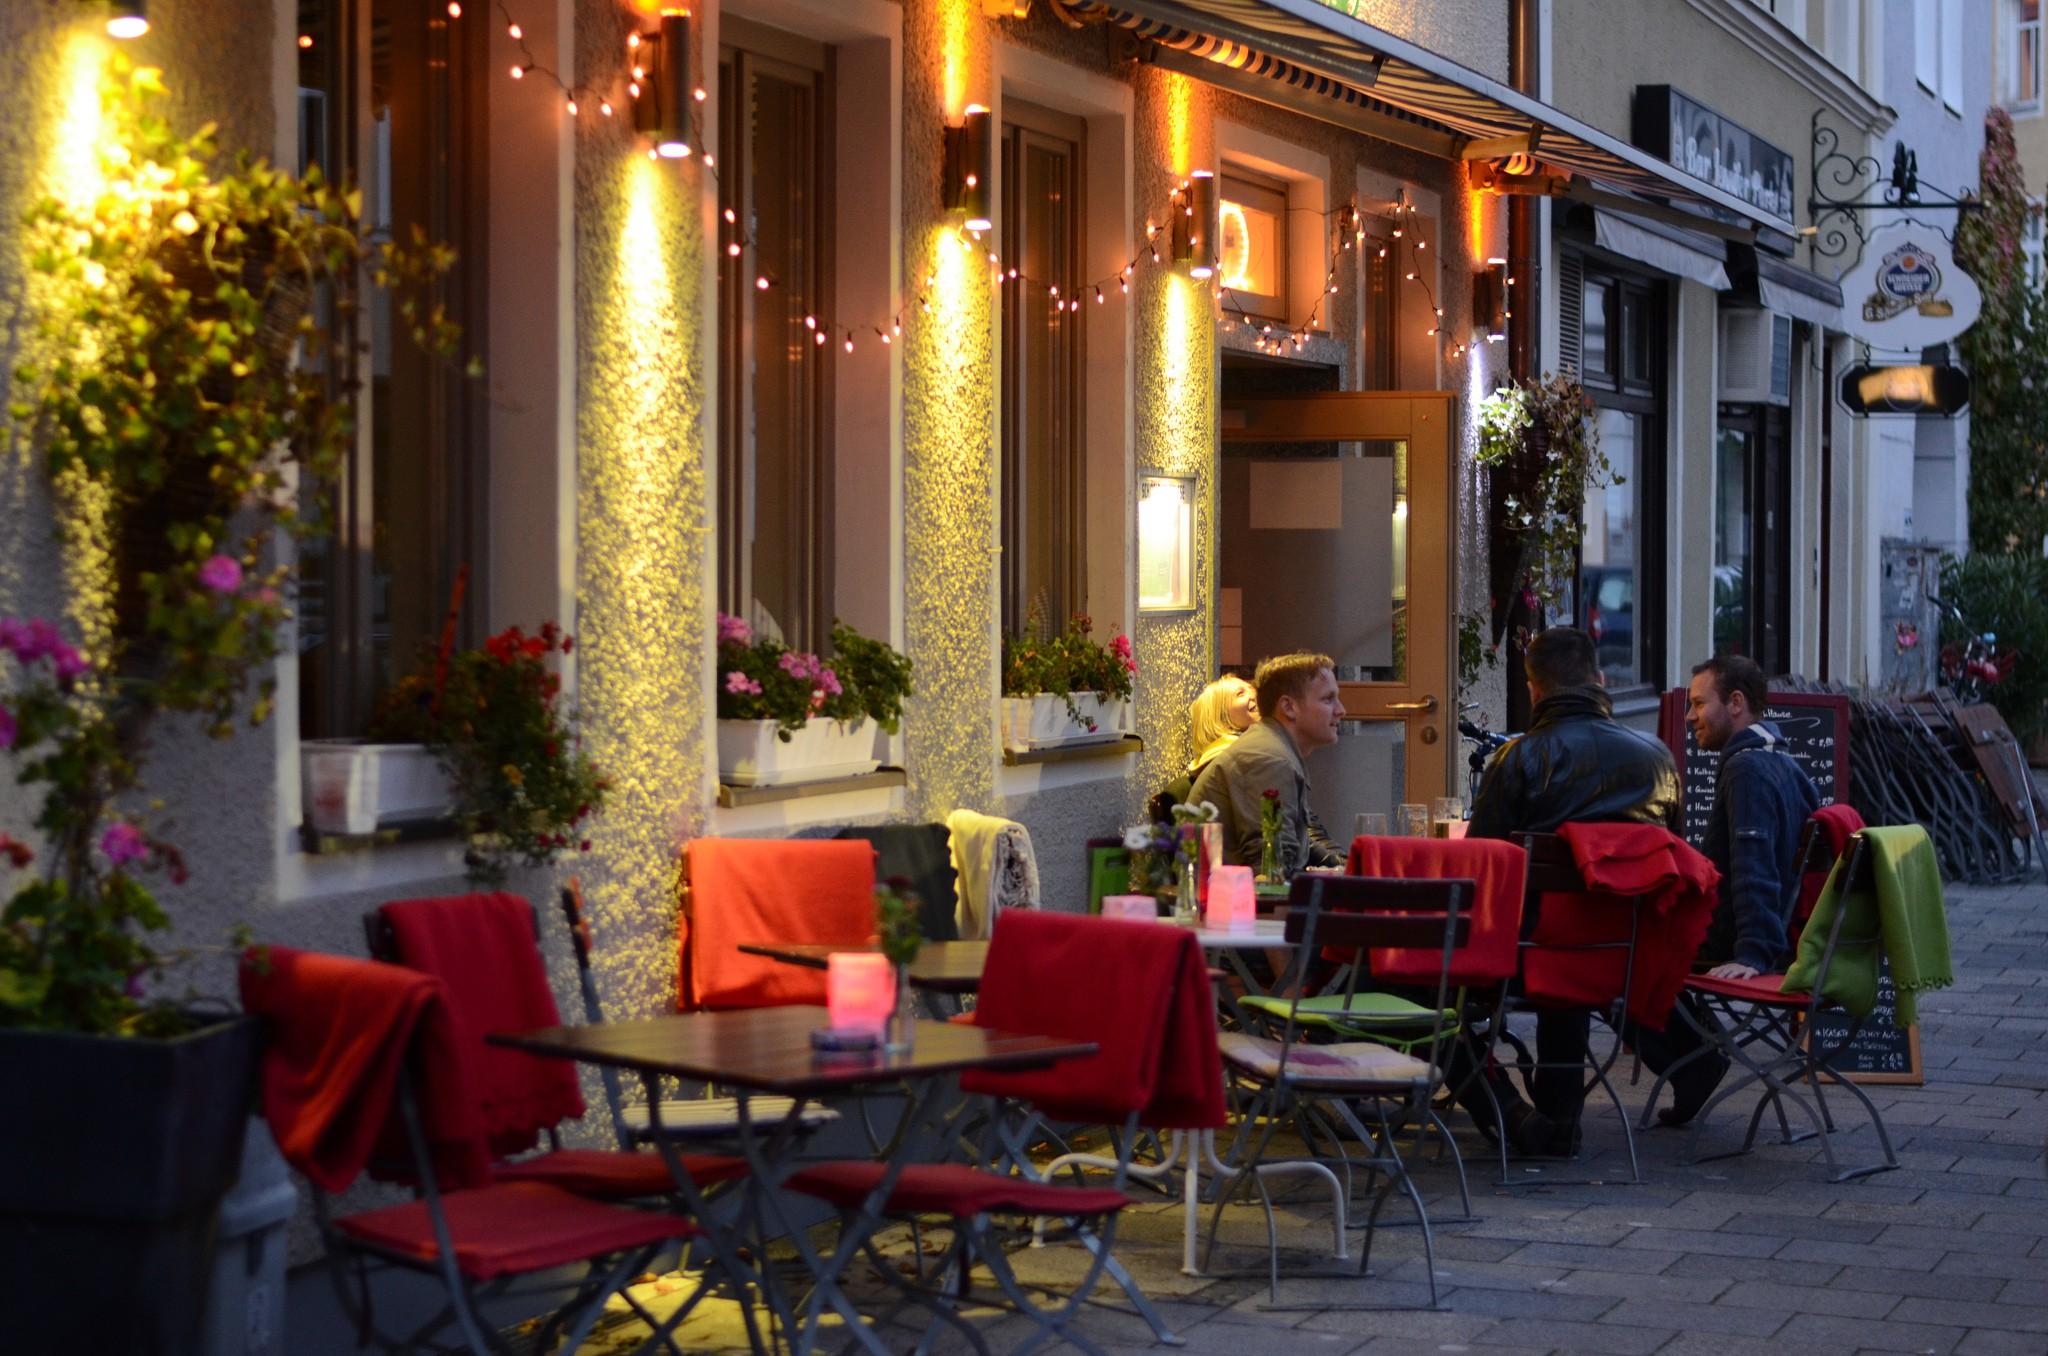 Cafe at sunset | © jonas01123/Flickr